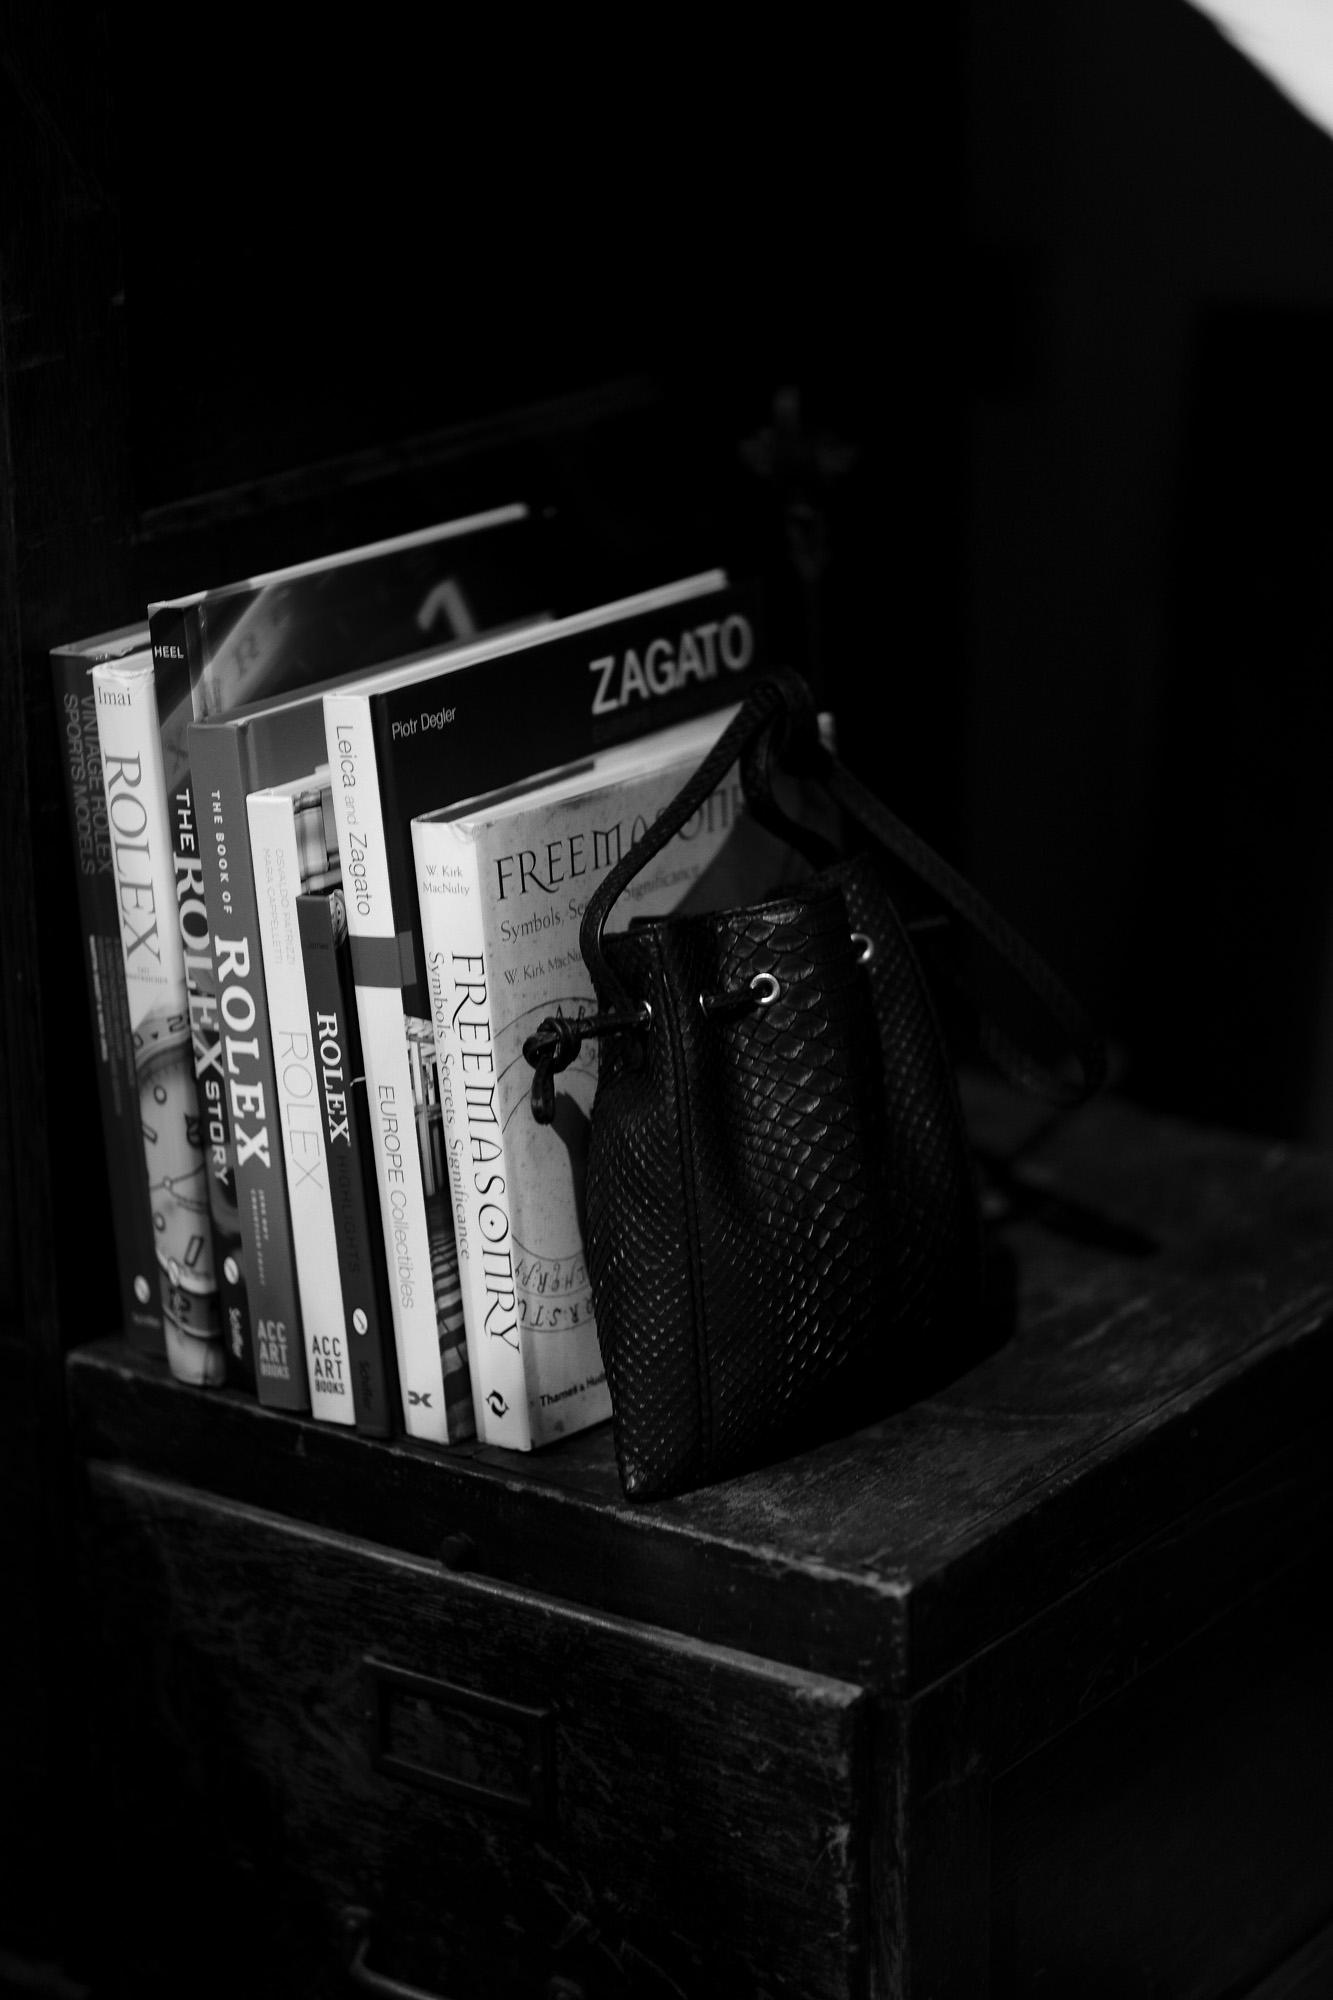 cuervo bopoha (クエルボ ヴァローナ) Satisfaction Leather Collection (サティスファクション レザー コレクション) FLOYD (フロイド) Python Leather (パイソンレザー) レザードローストリングバック 巾着 BLACK (ブラック) Made in Japan (日本製) 2020秋冬【Special Model】 愛知 名古屋 altoediritto アルトエデリット レザーバック スモールバック エキゾチックレザー